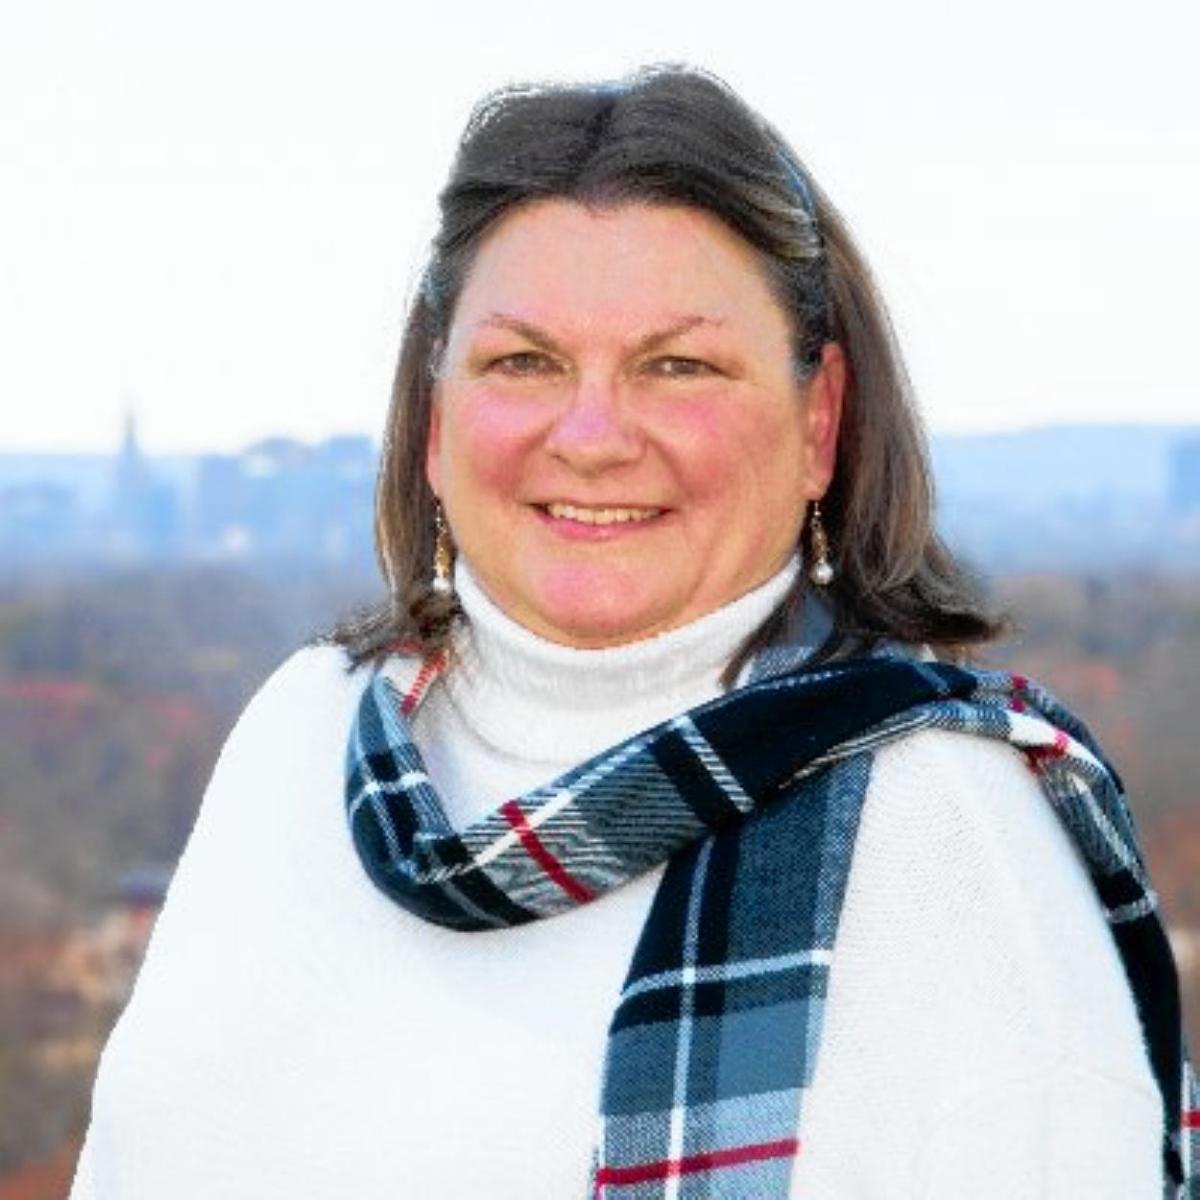 Cathy Hopperstad